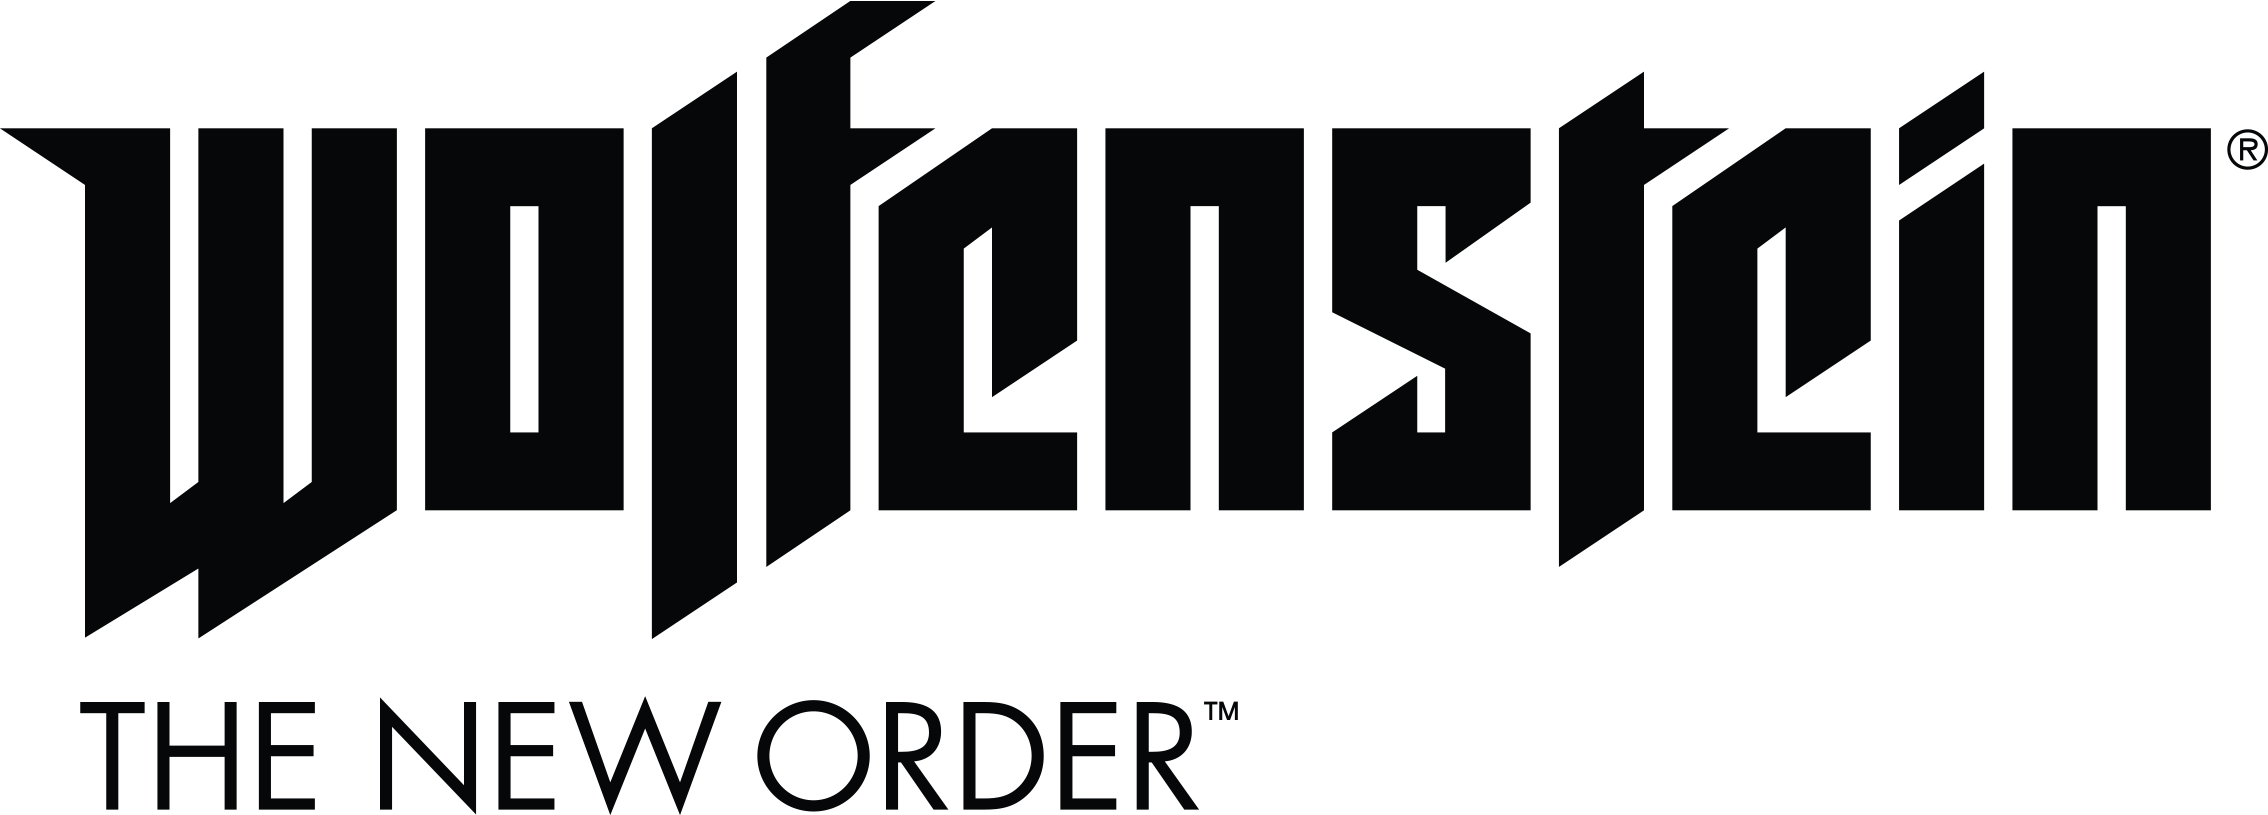 Первые оценки Wolfenstein: The New Order  - Изображение 1